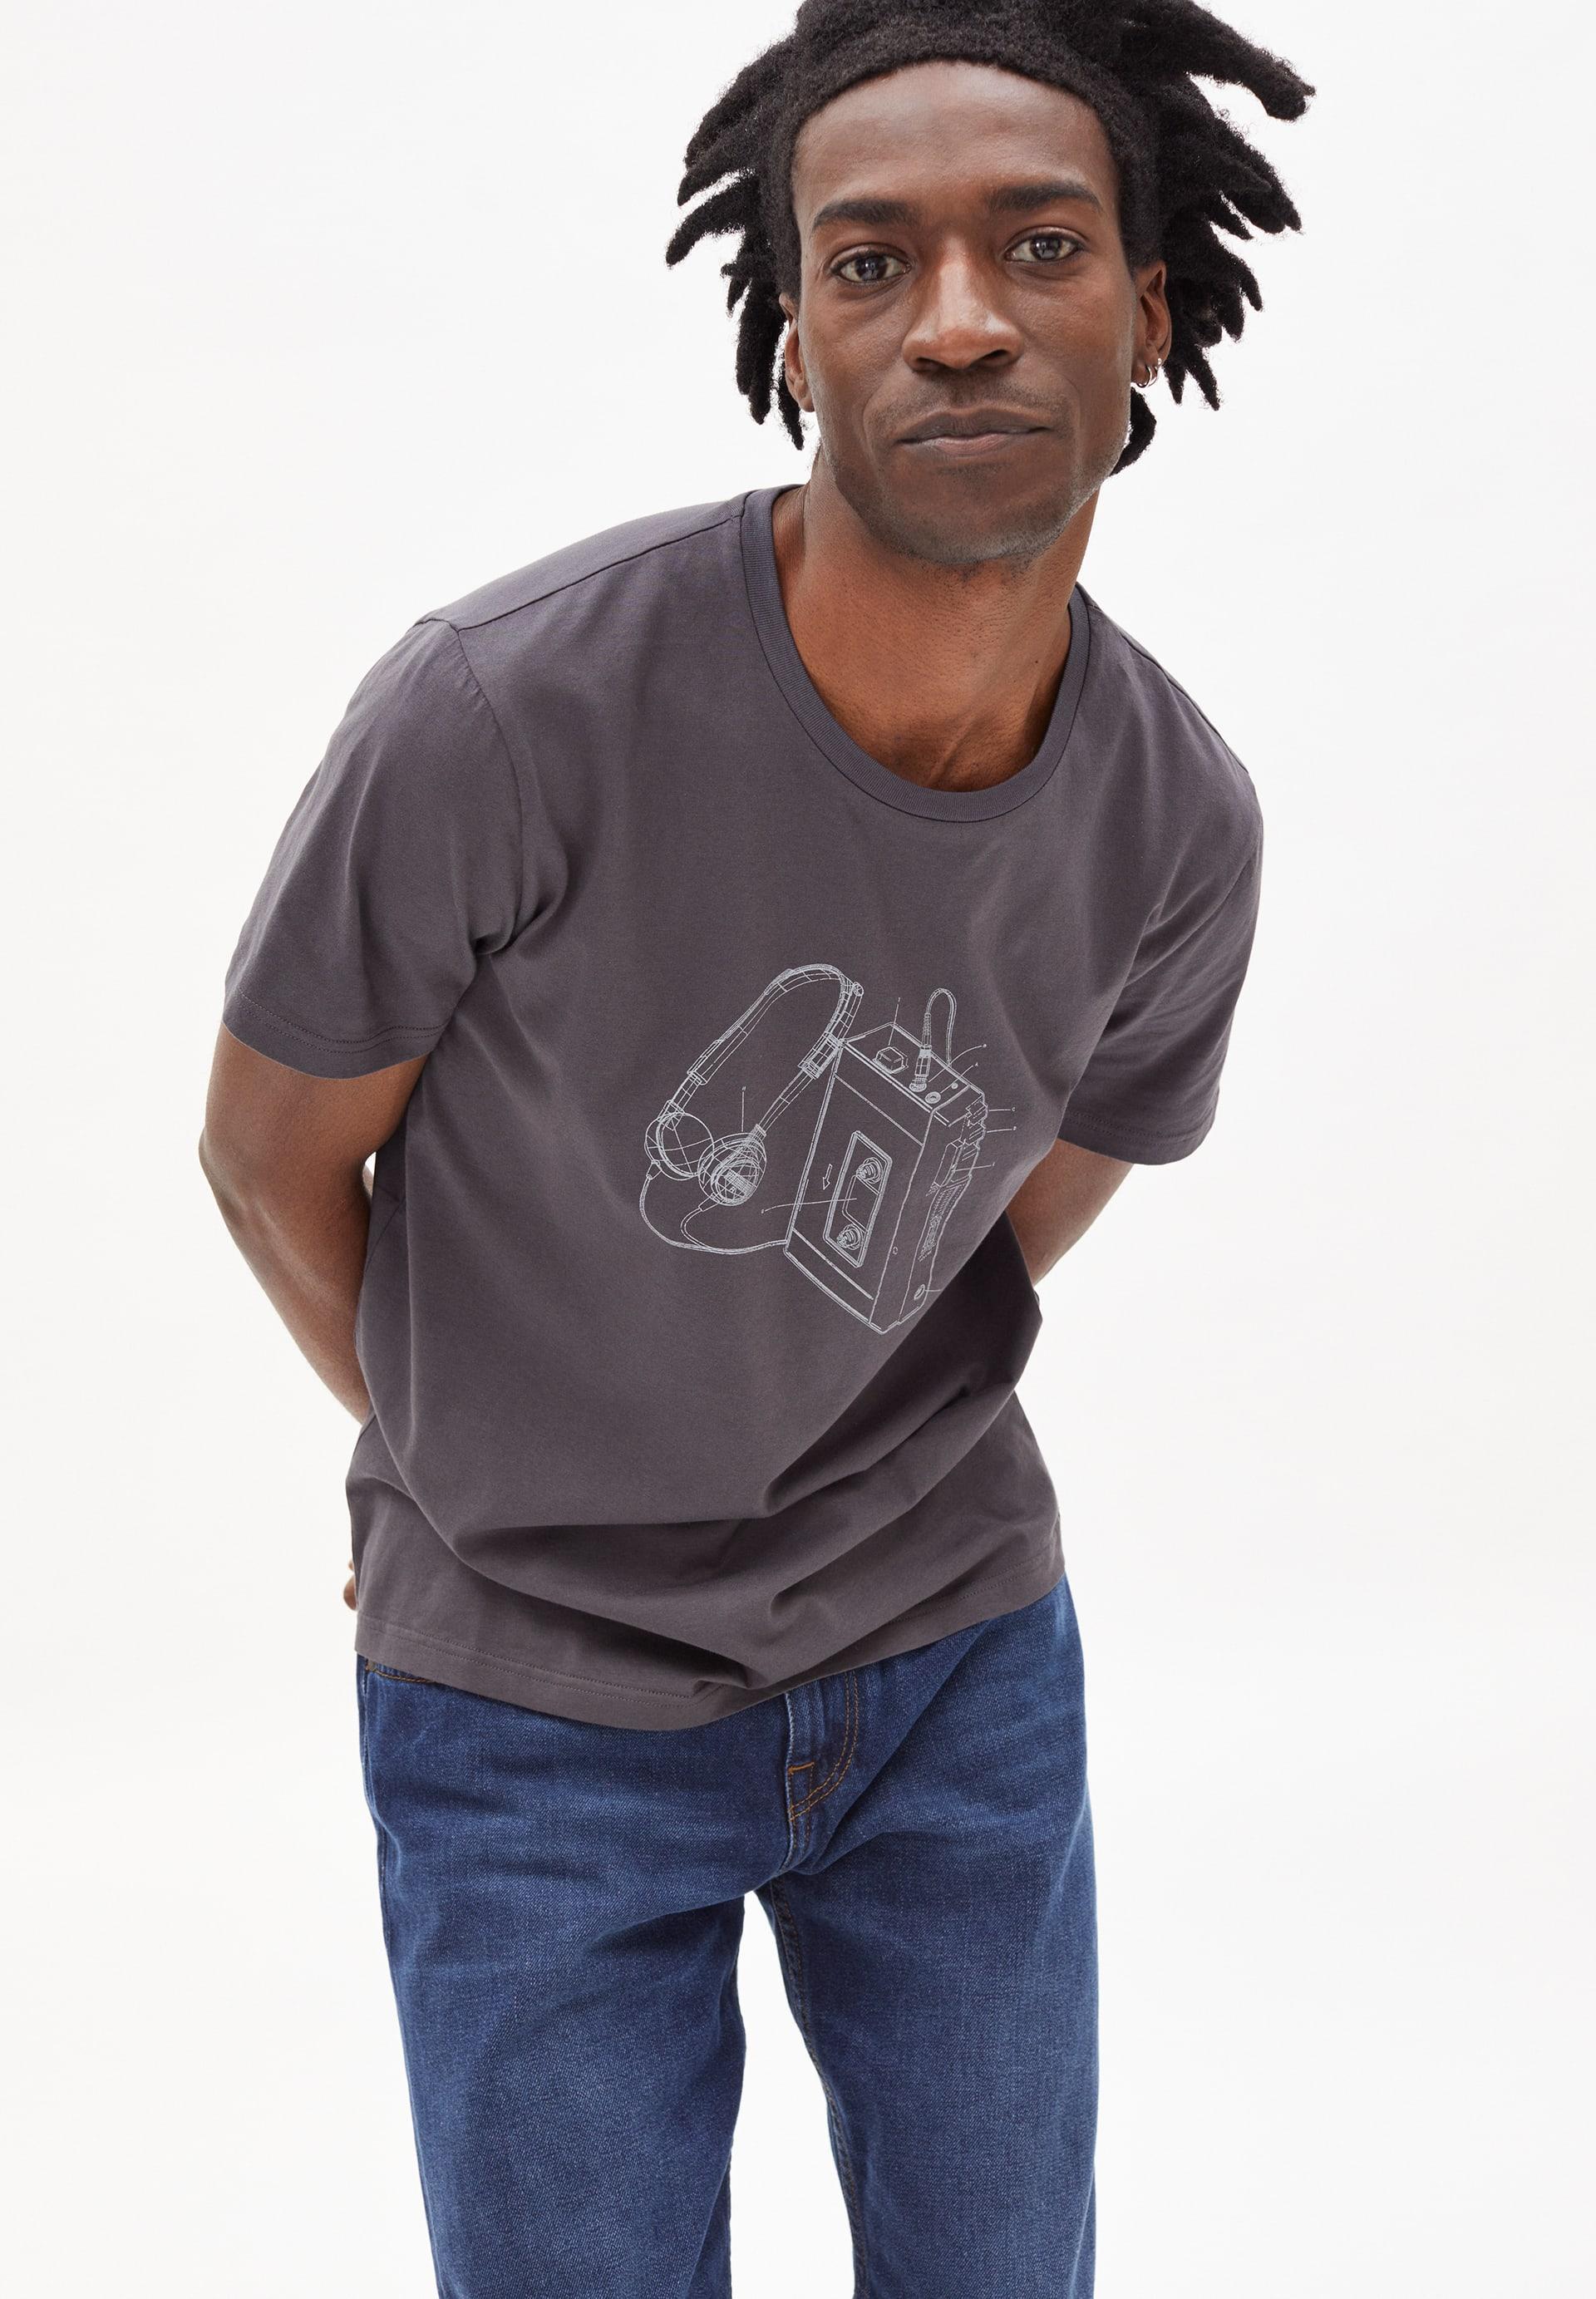 JAAMES WALKMAN T-shirt en coton biologique